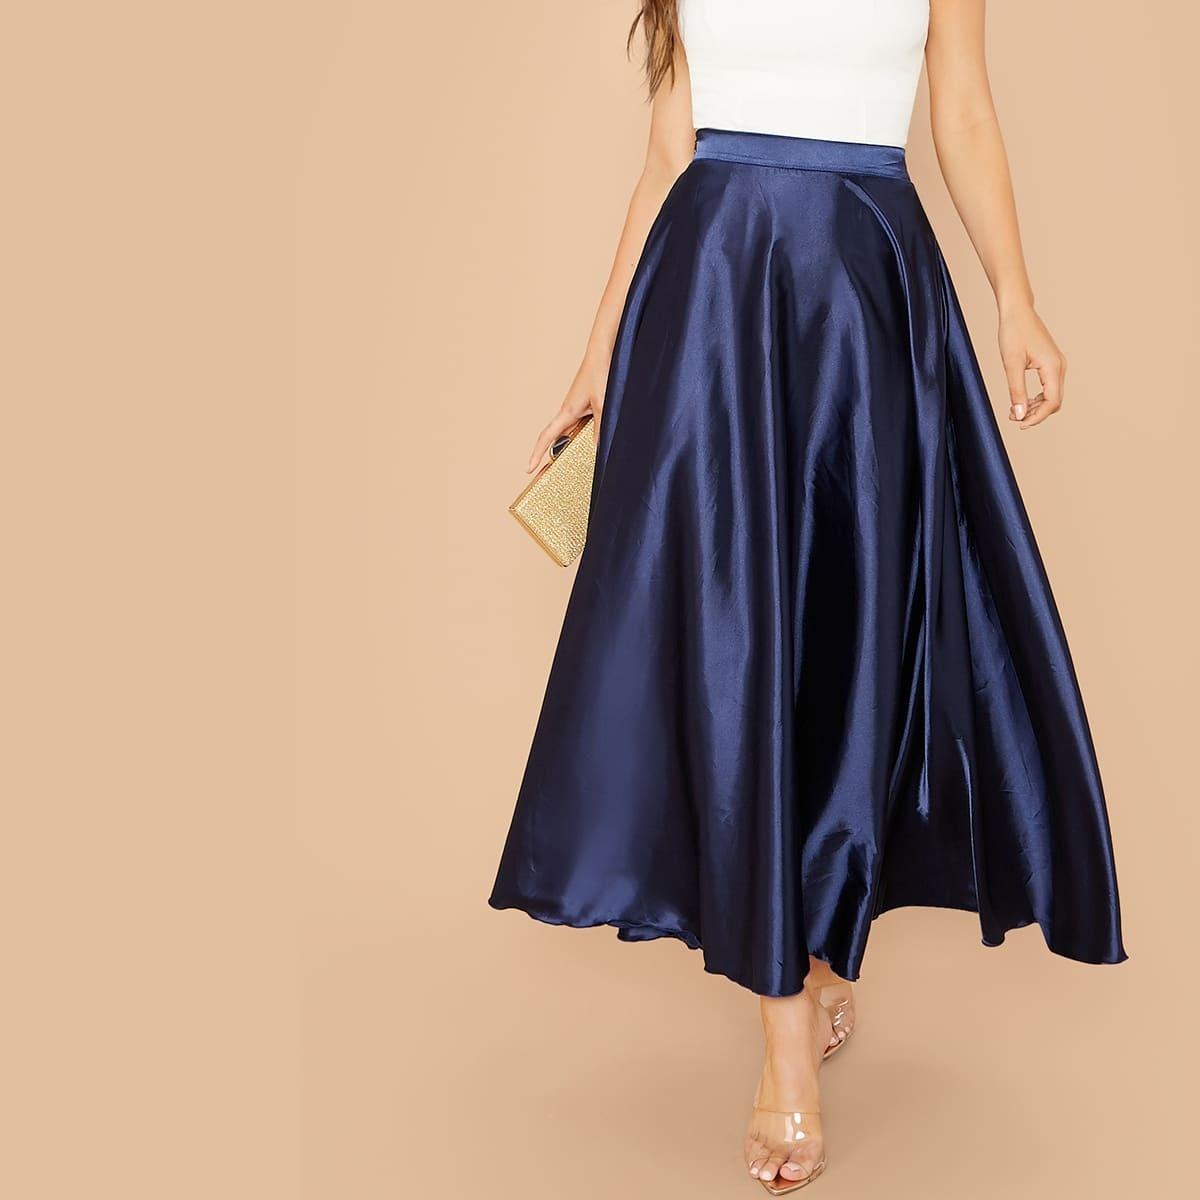 Однотонная атласная юбка